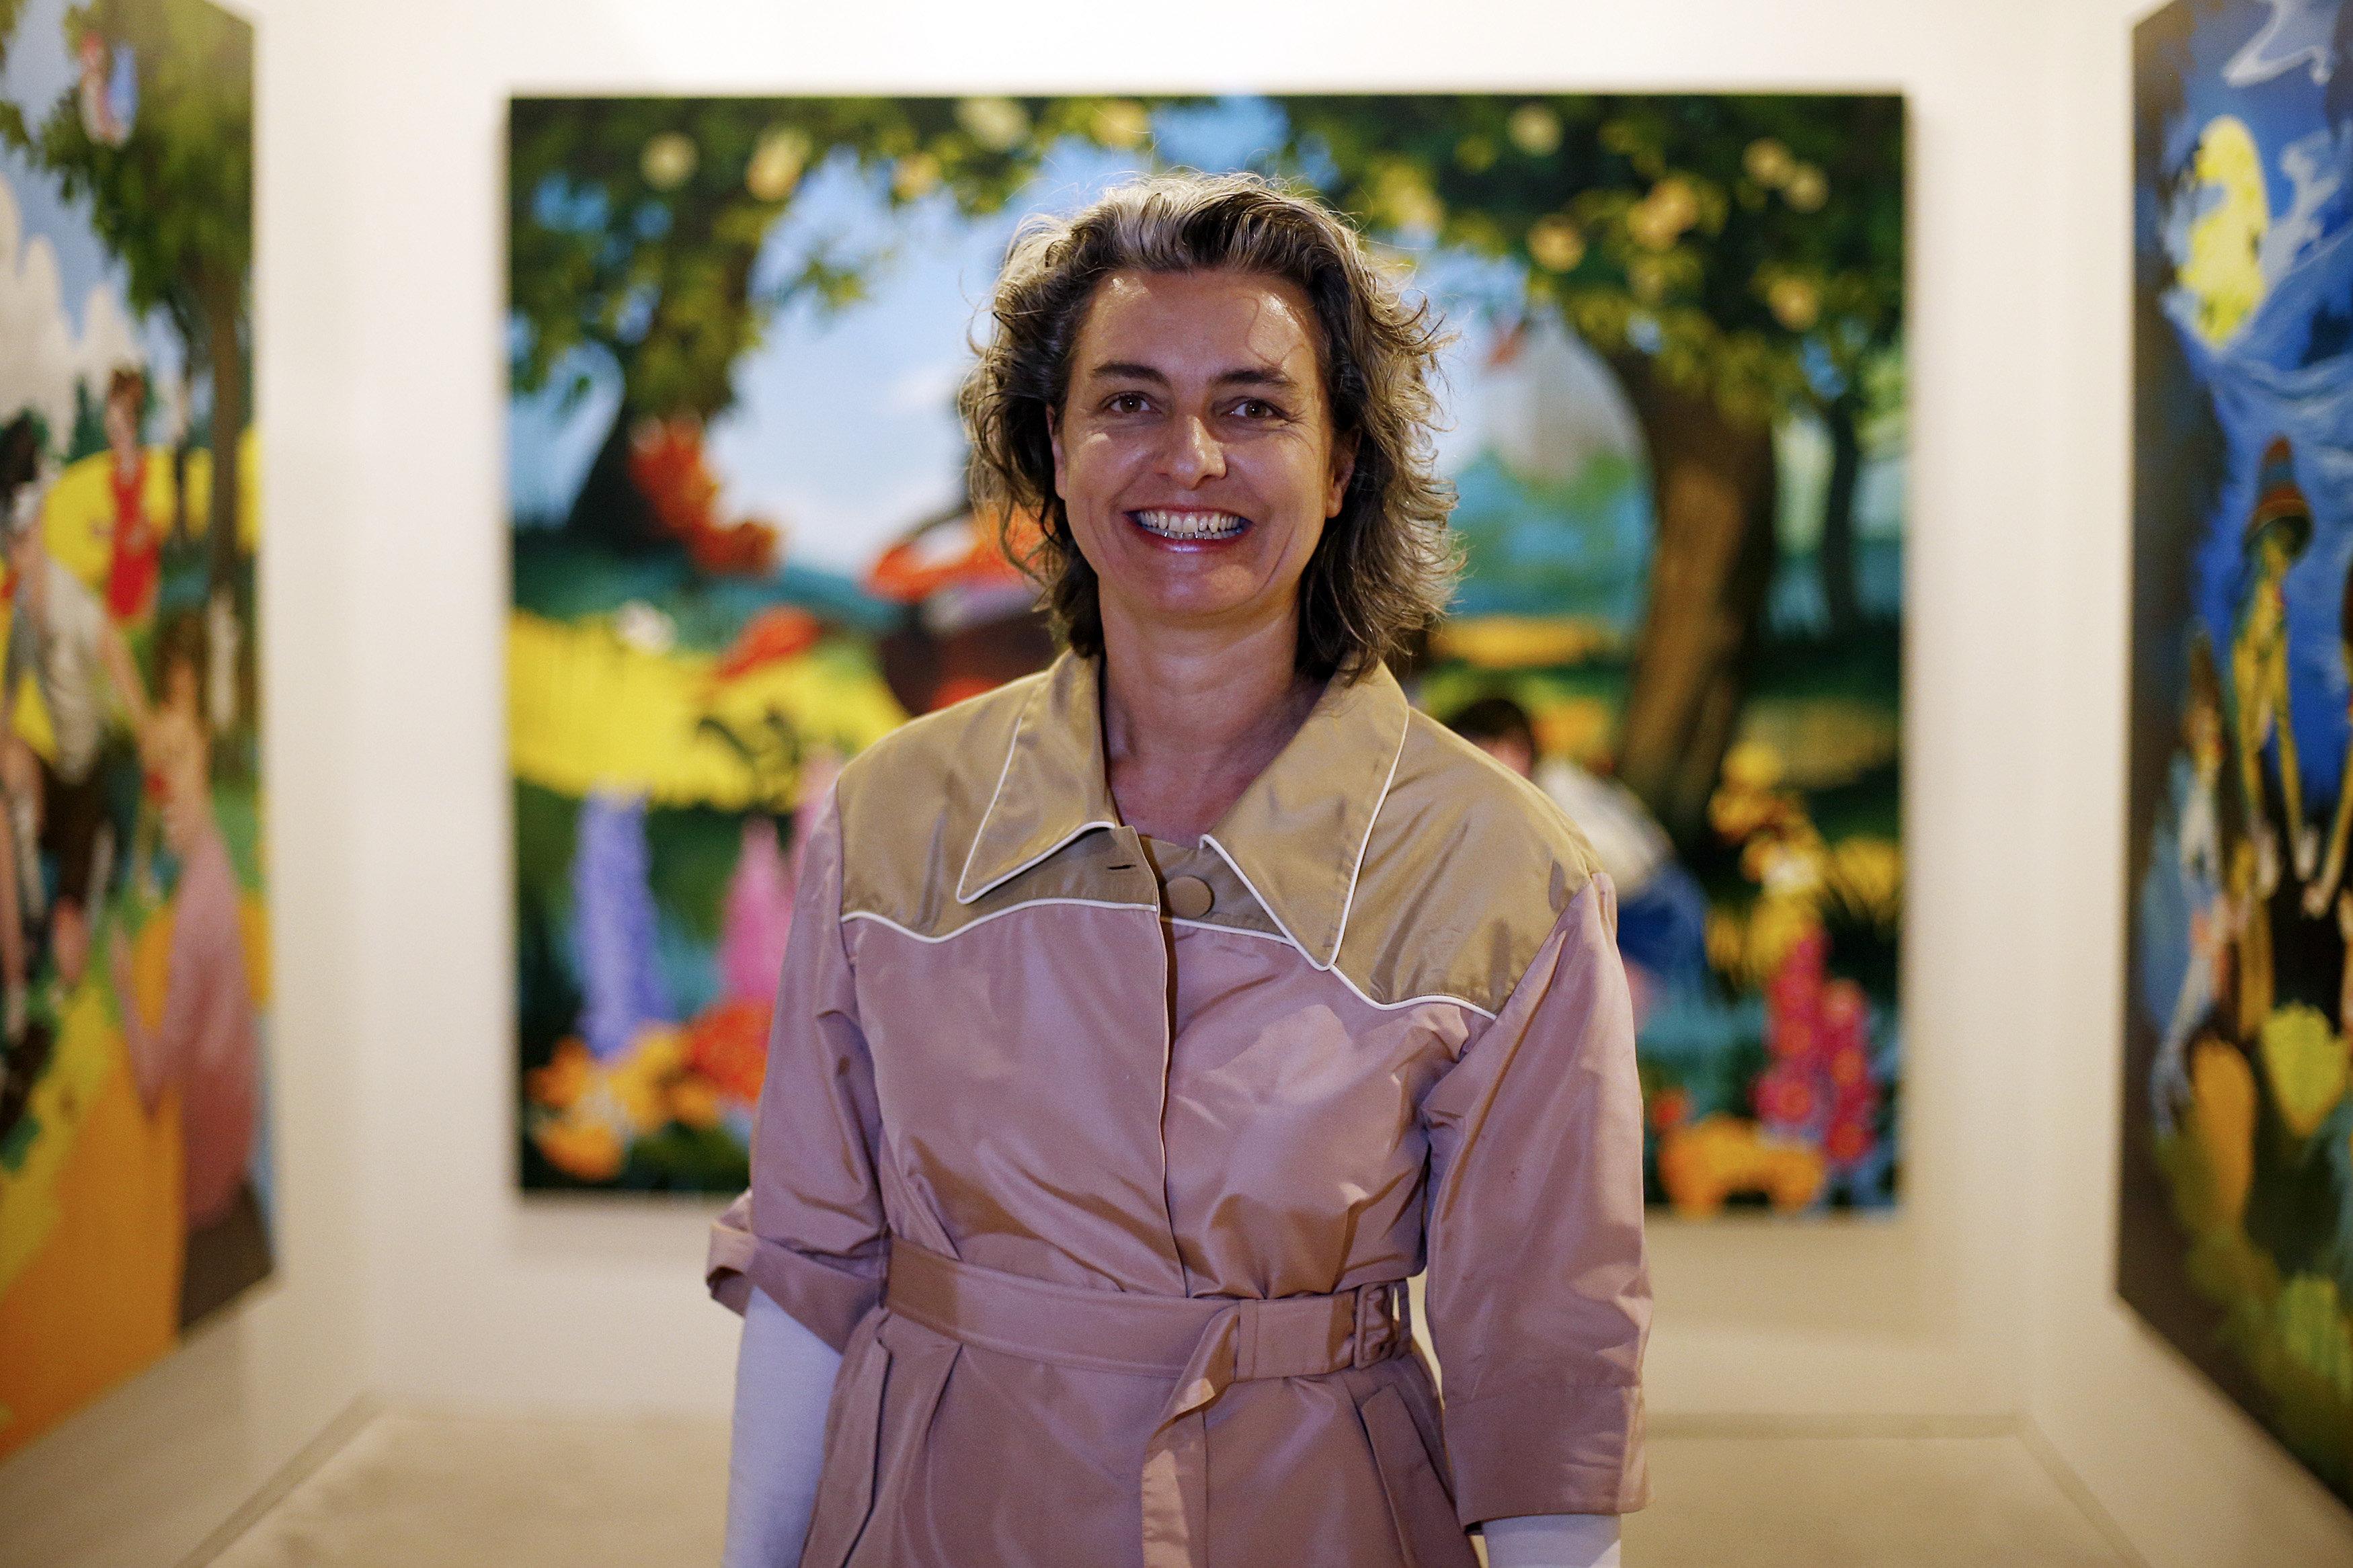 Feria de arte contemporáneo de Chile pone acento en creación latinoamericana